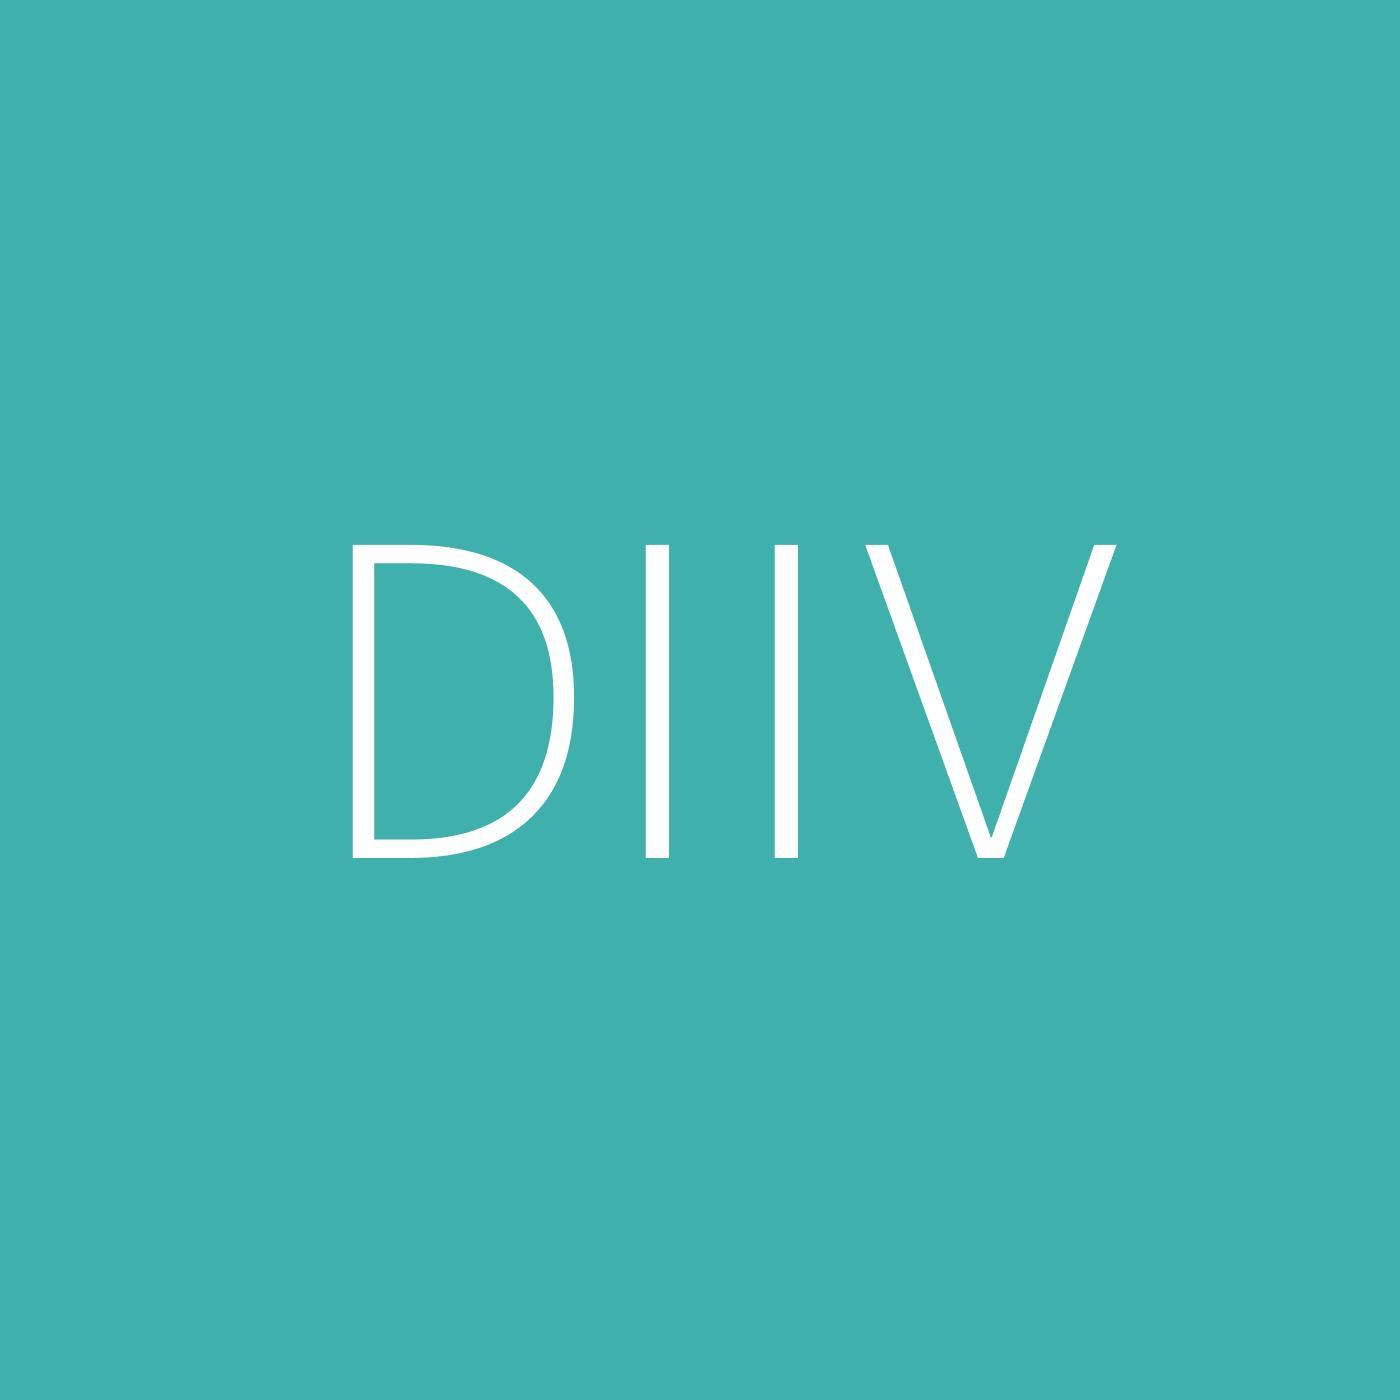 DIIV Playlist Artwork